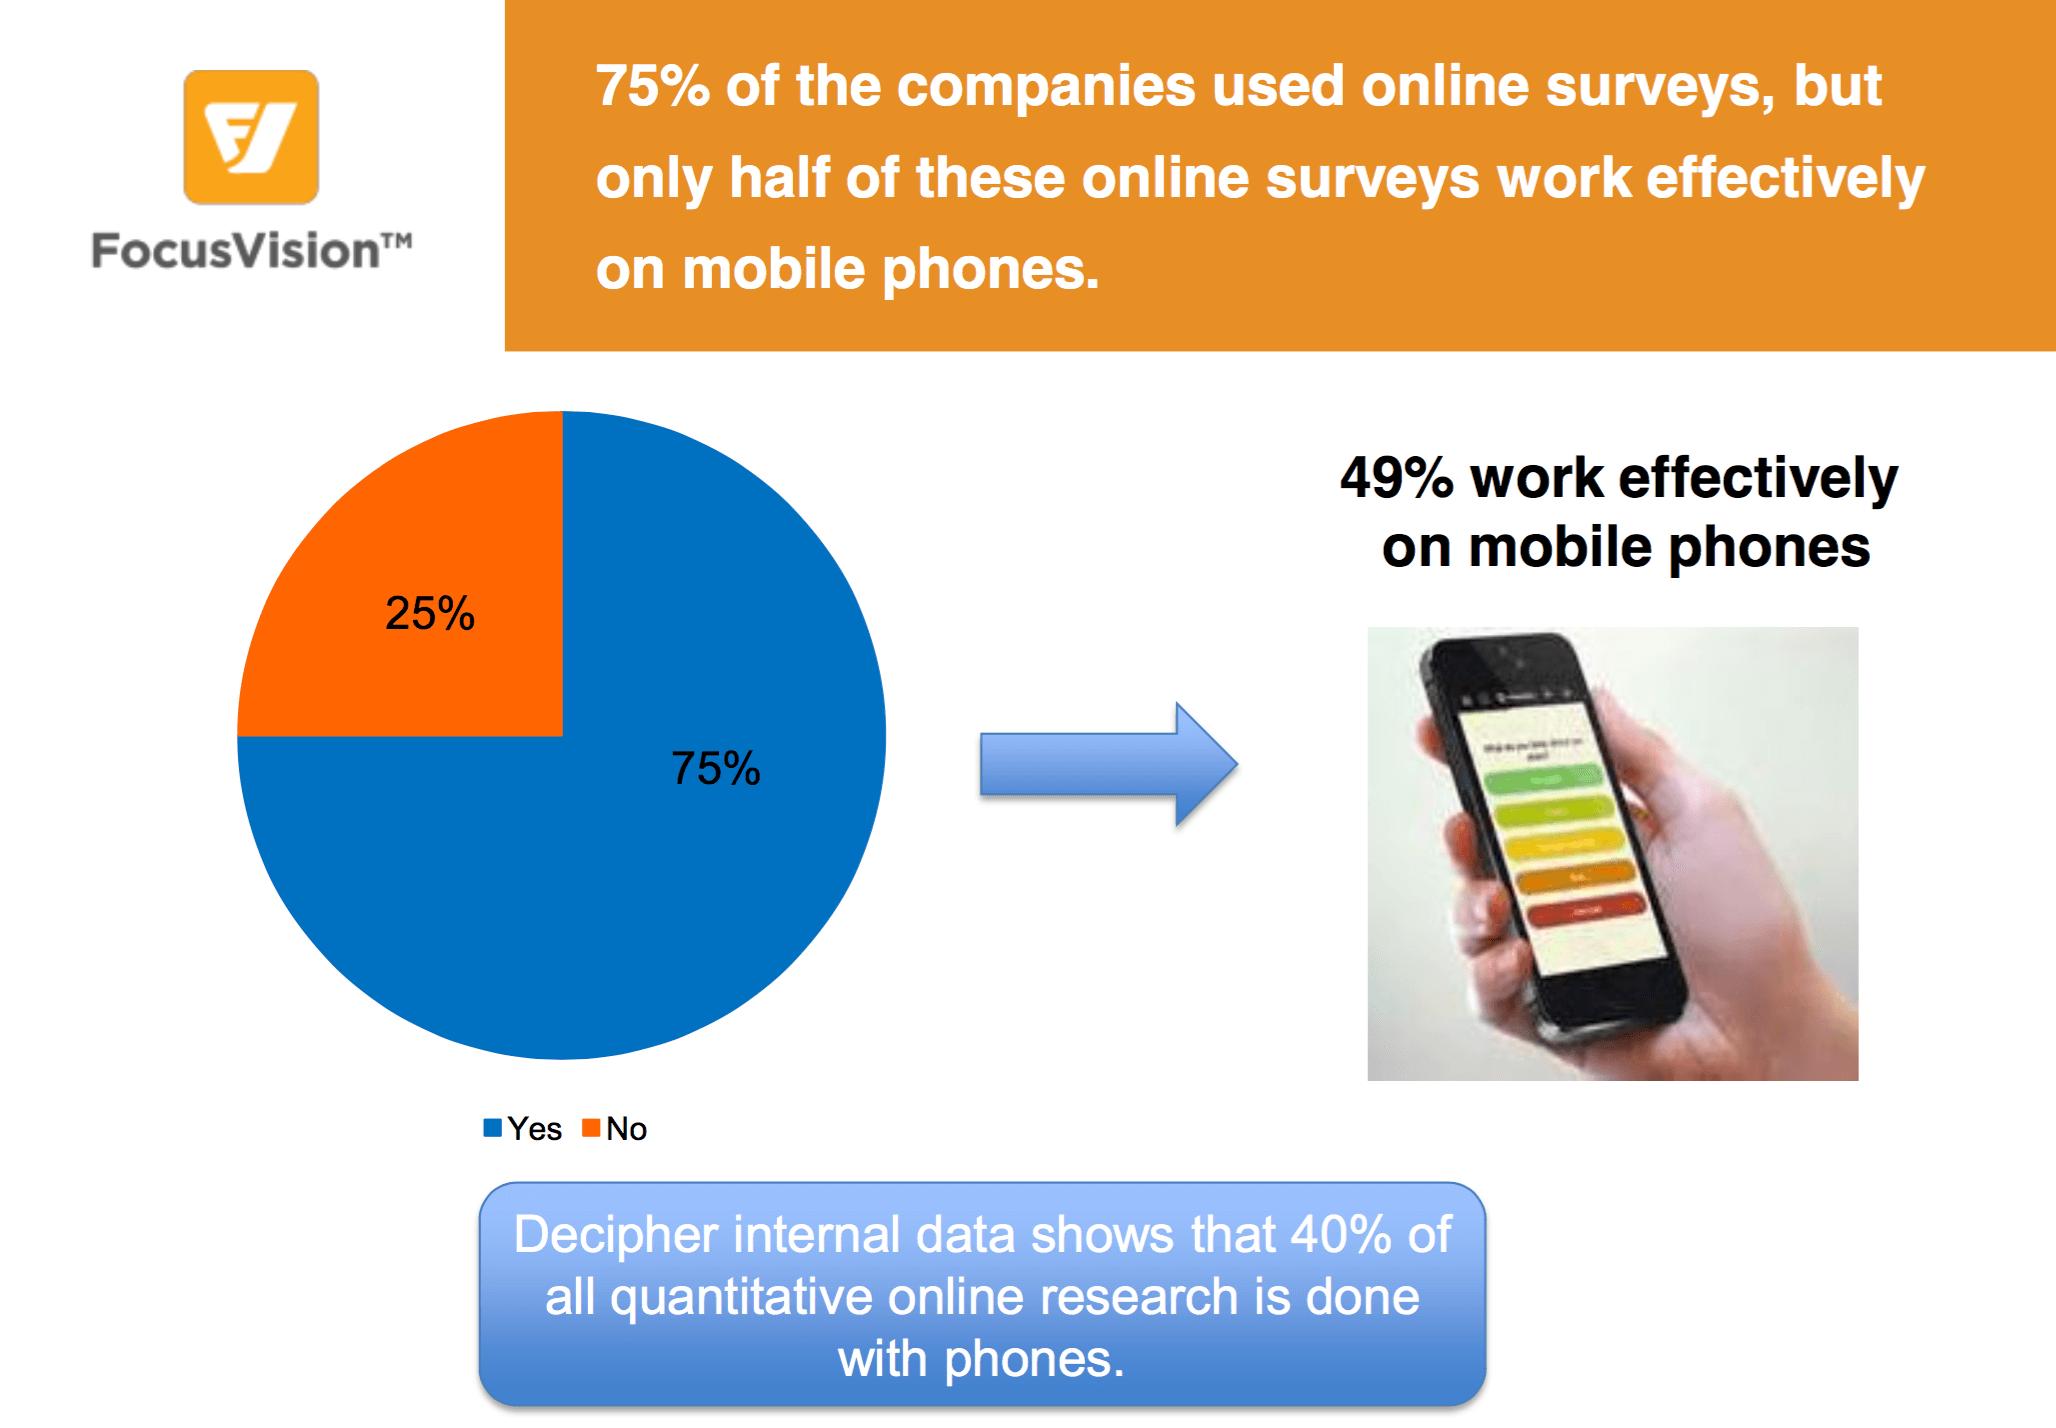 Importance of mobile friendly online surveys